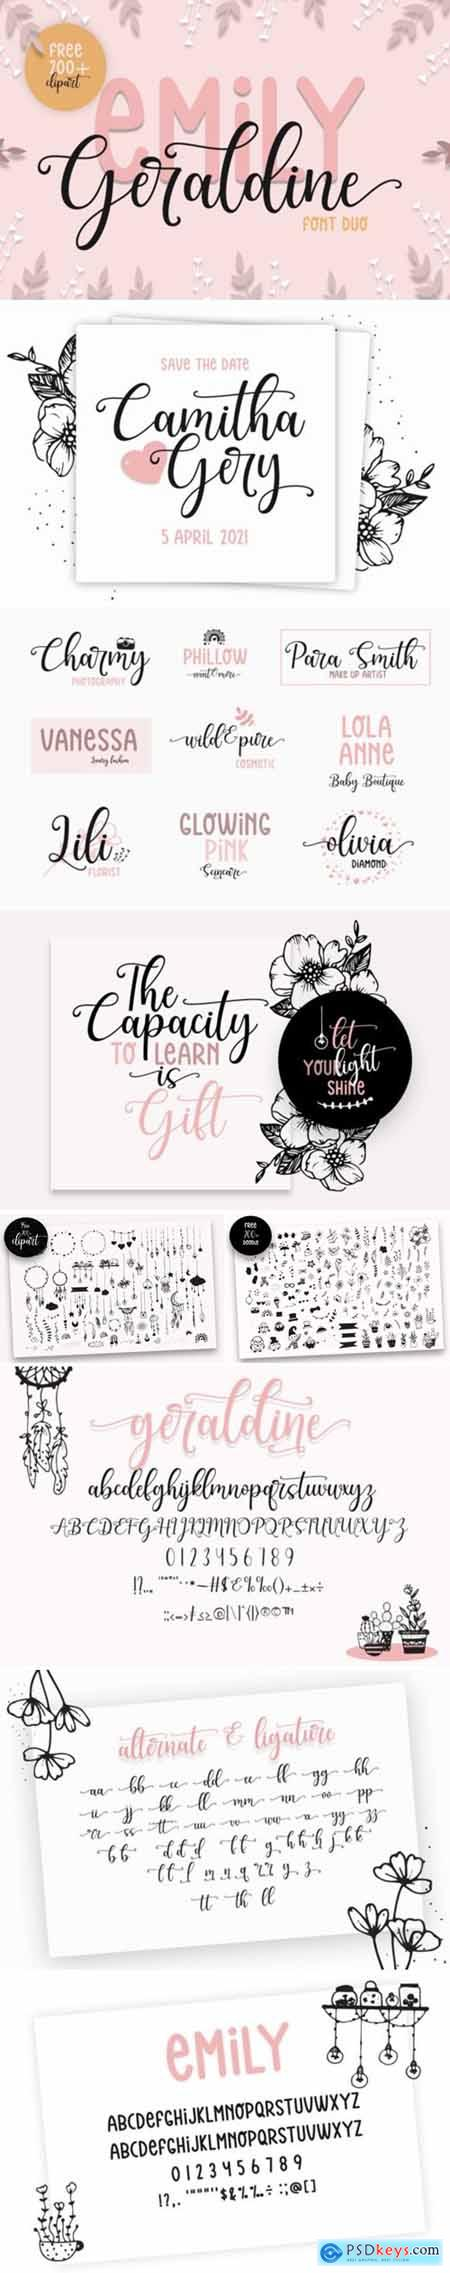 Emily Geraldine Font